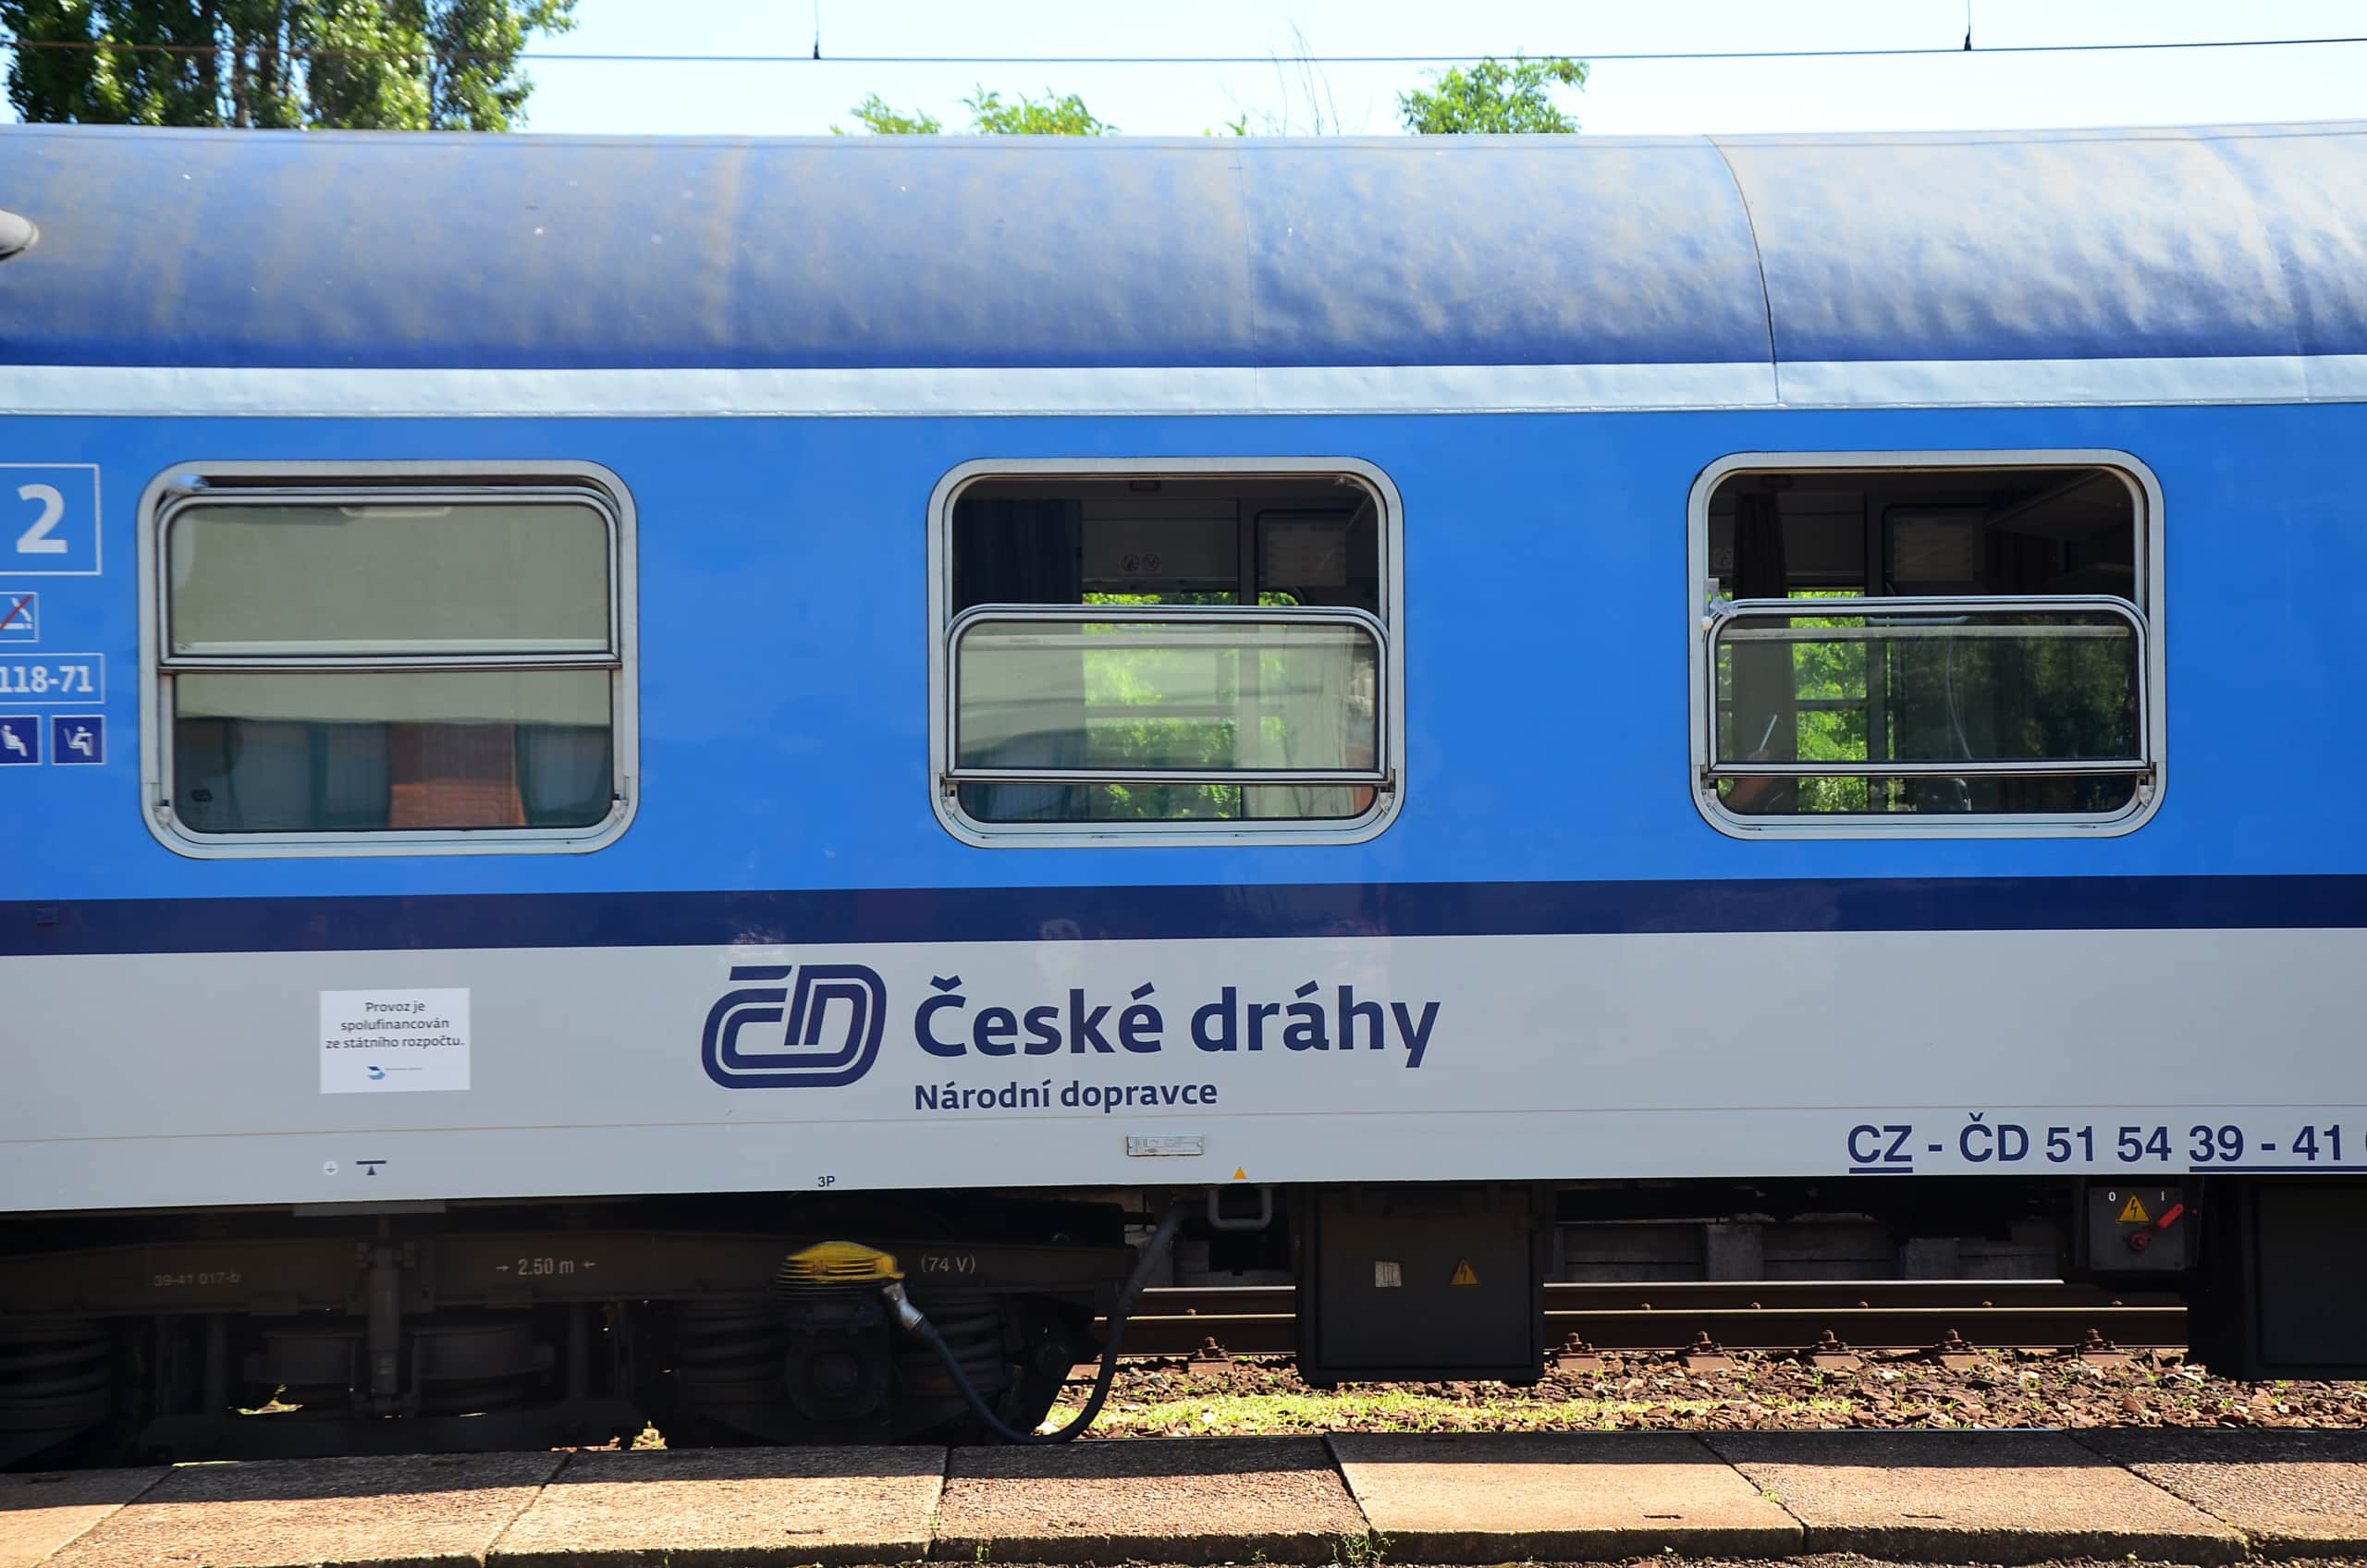 Zug Radtour an der Elbe entlang in Tschechien